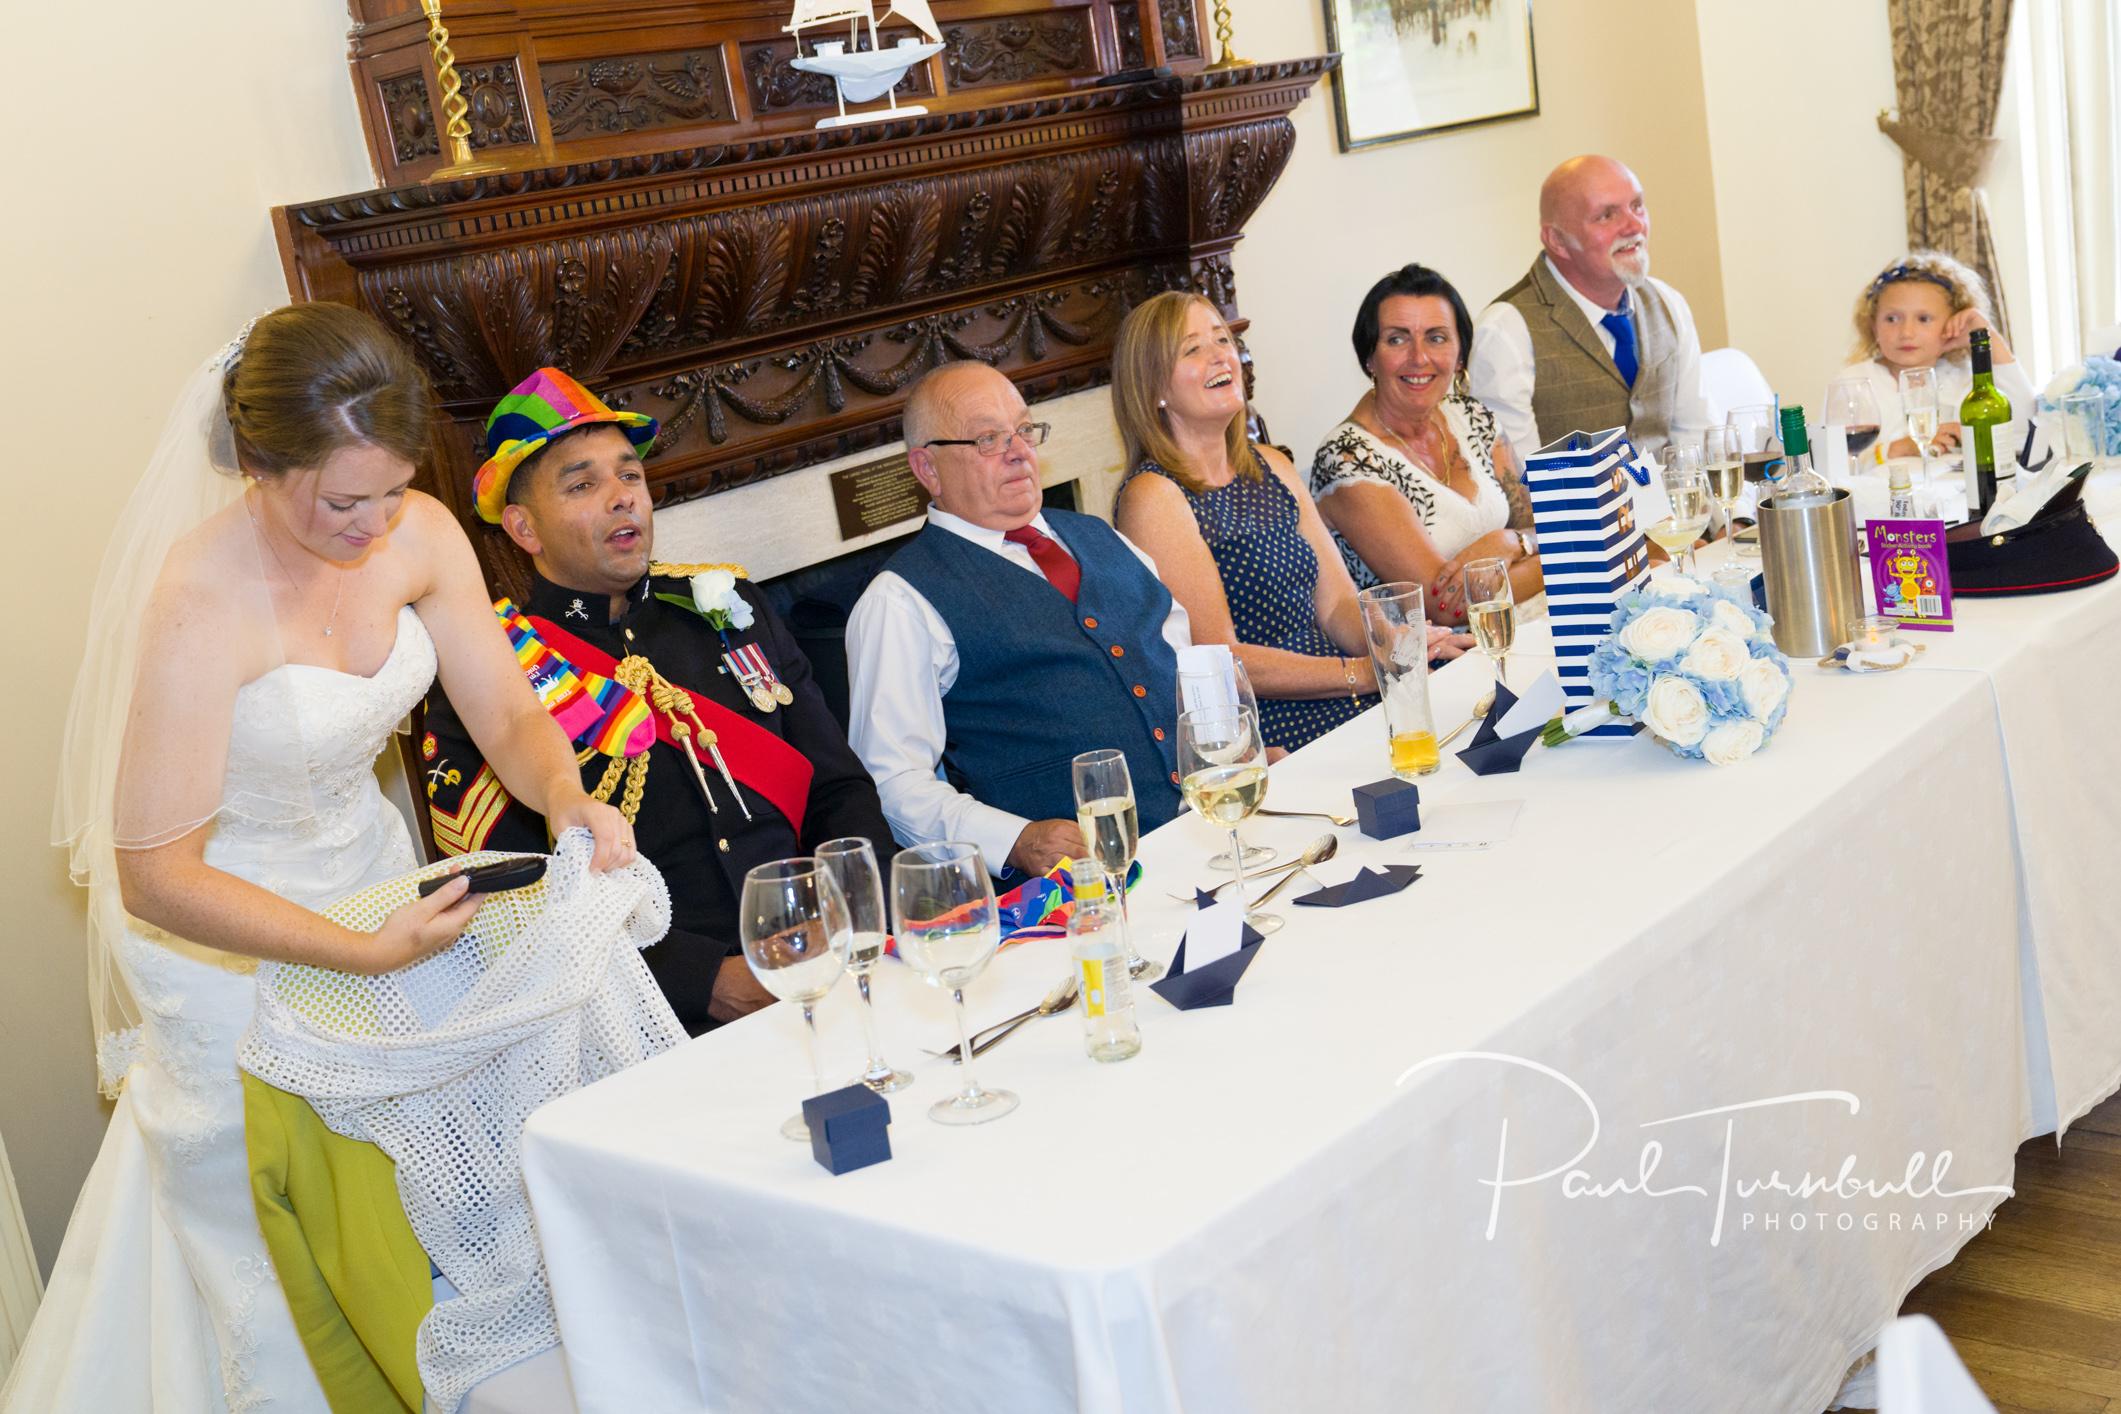 wedding-photographer-south-dalton-walkington-yorkshire-emma-james-064.jpg